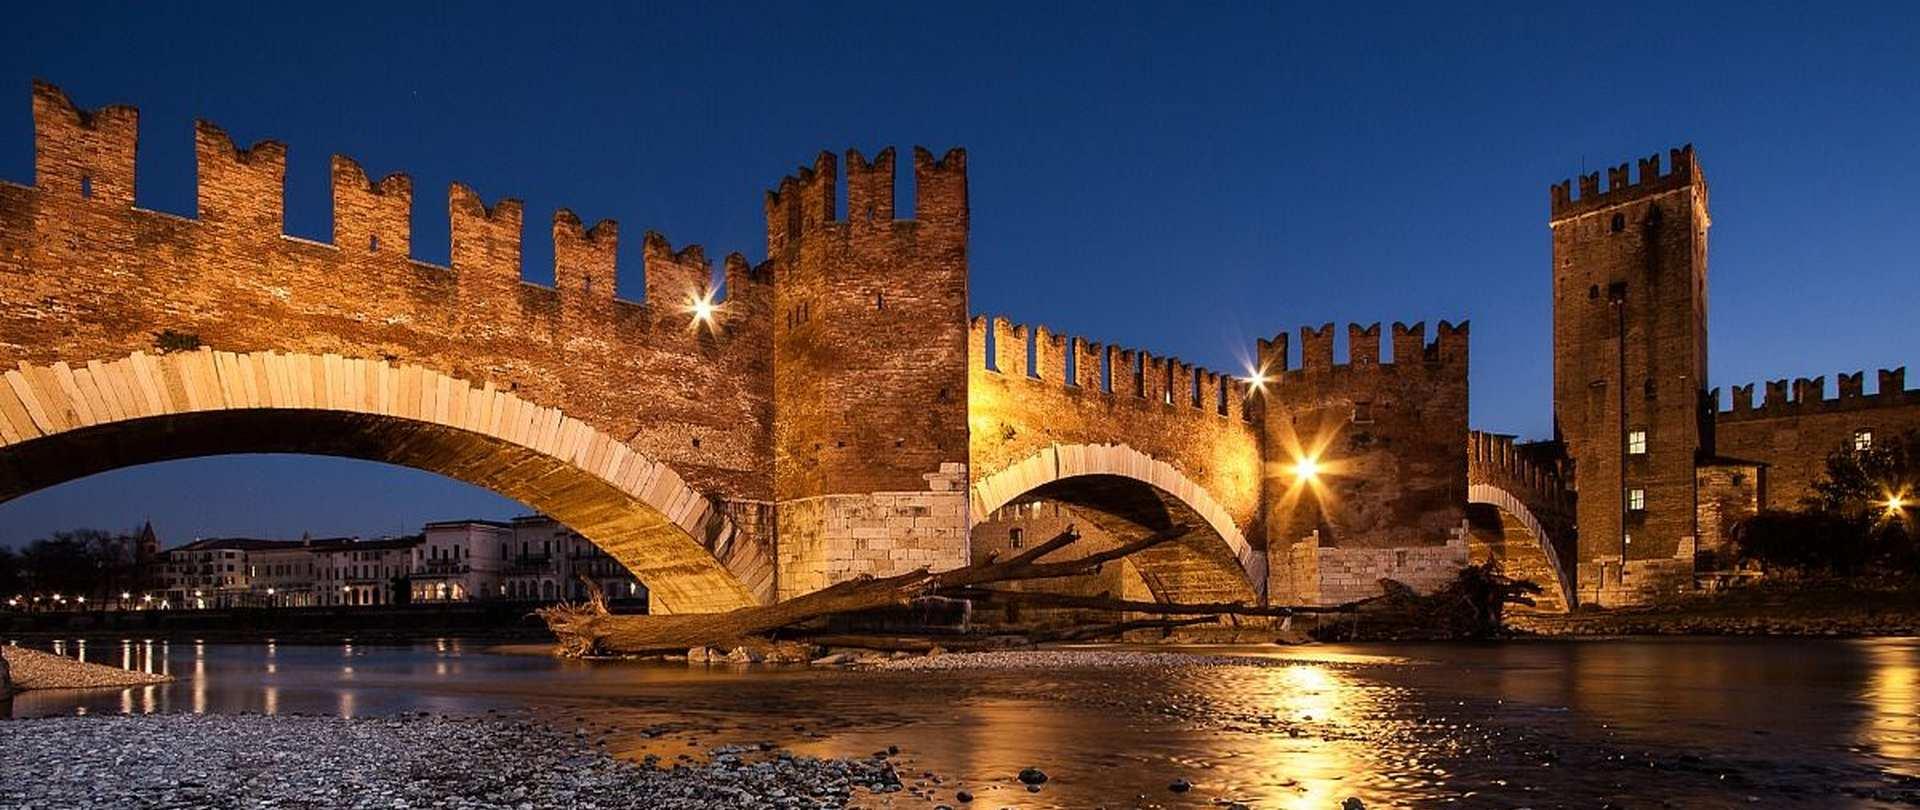 castelvecchio-ponte-scaligero.jpg.1920x810_0_24_15999.jpeg